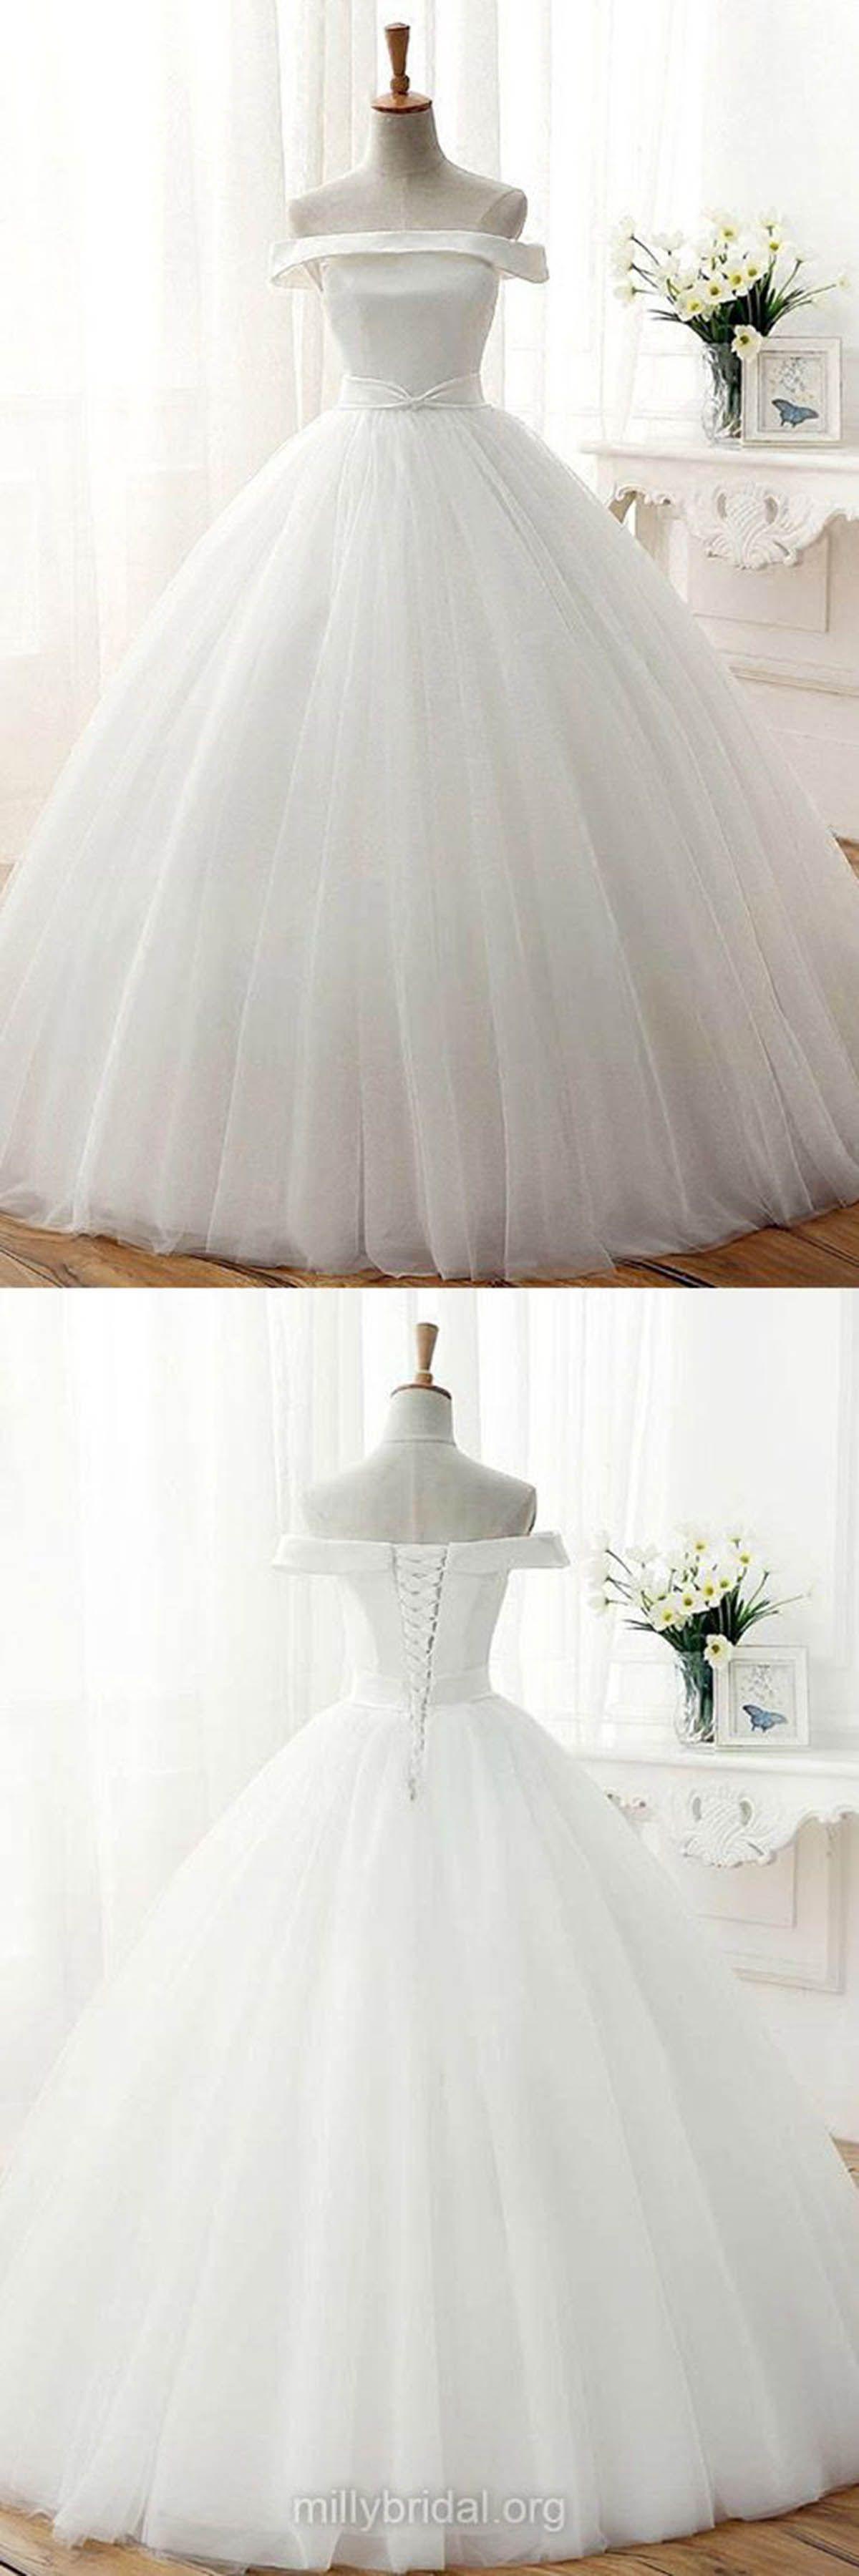 Simple white tulle off shoulder long aline wedding dress white